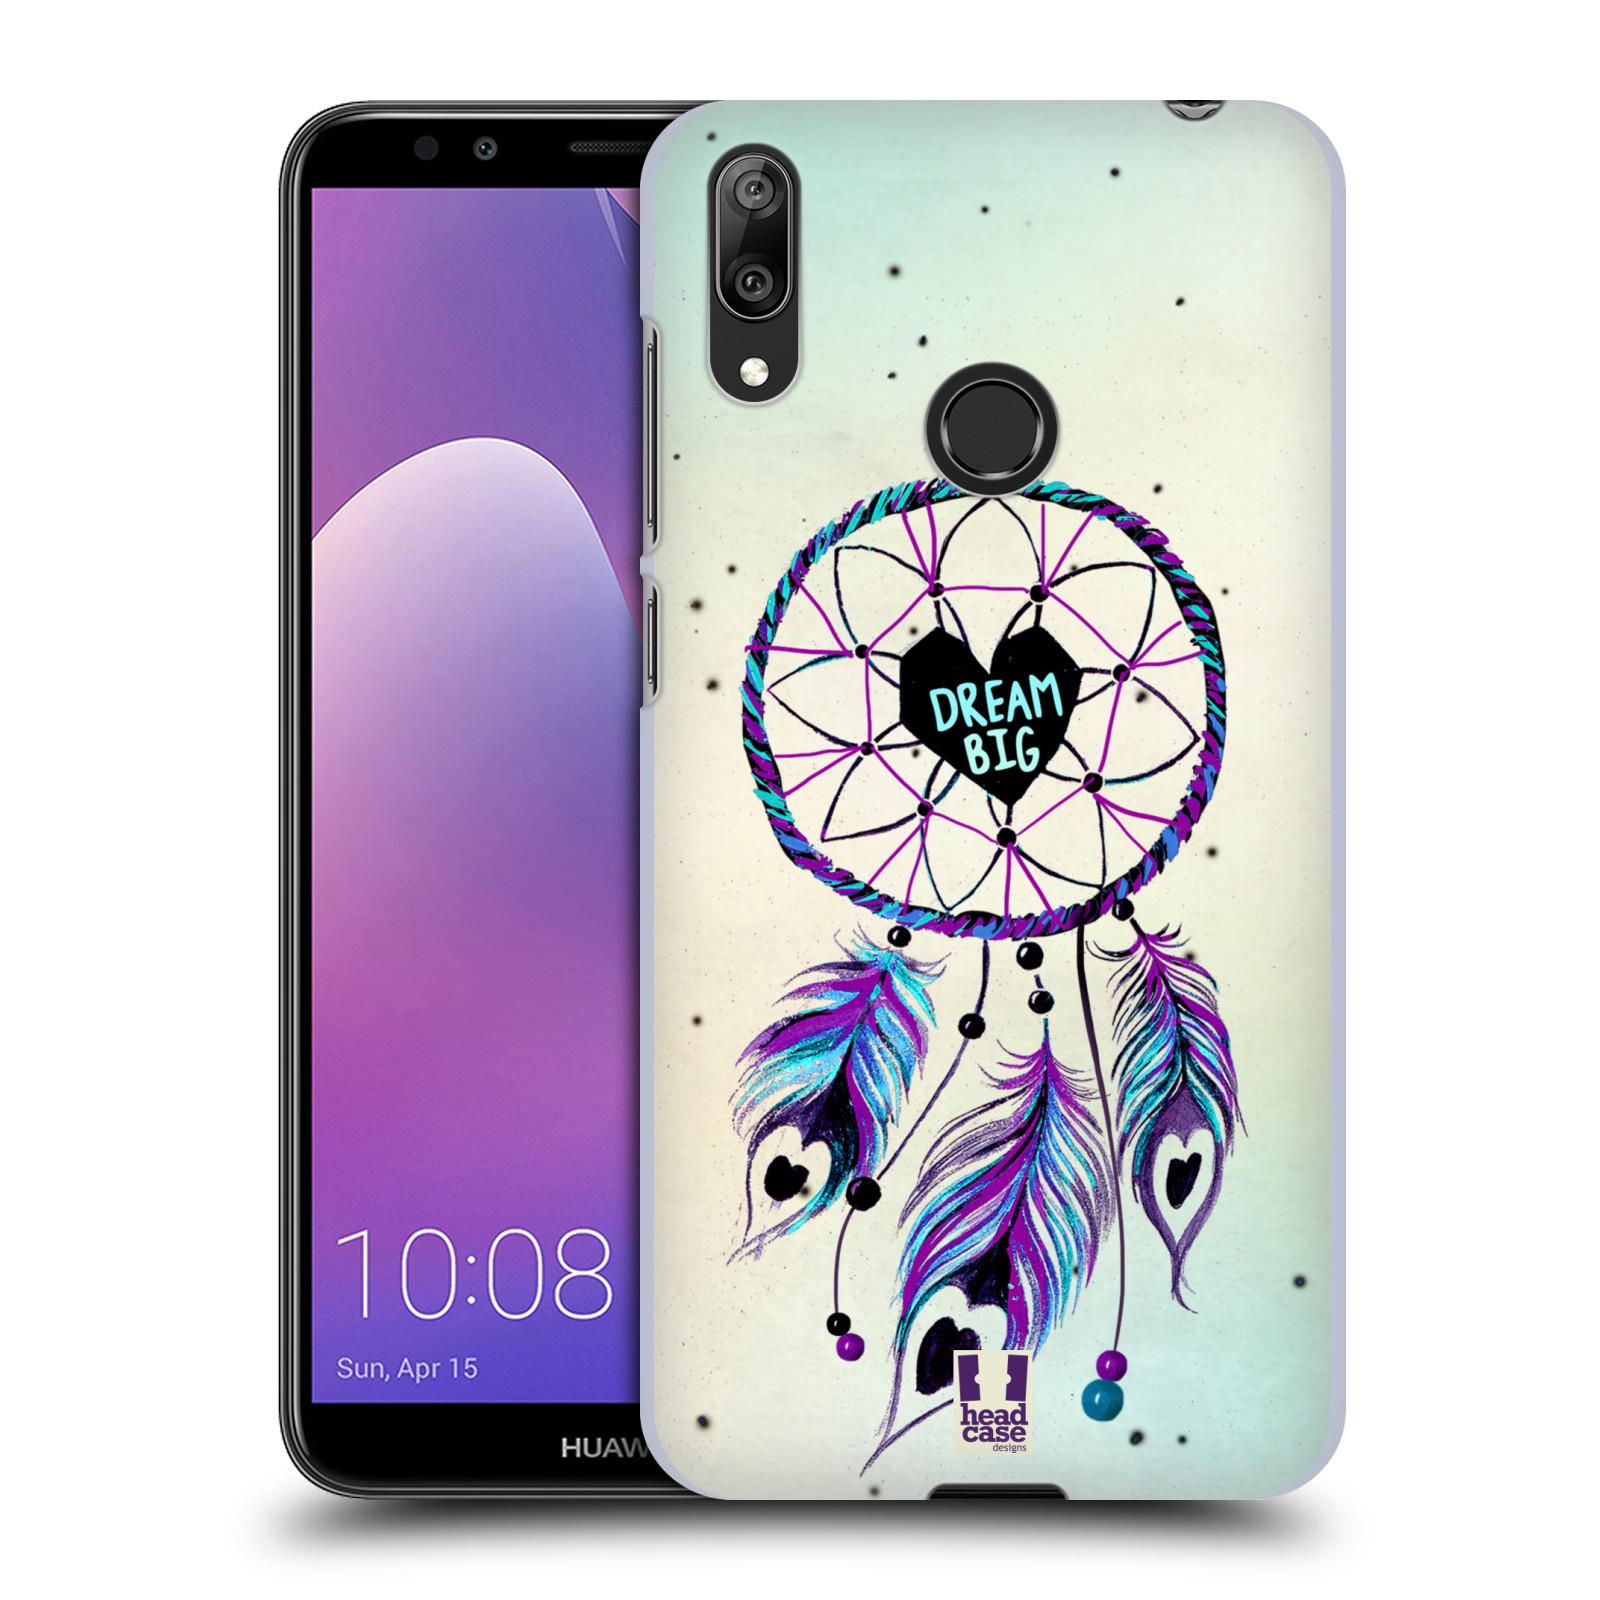 Plastové pouzdro na mobil Huawei Y7 (2019) - Head Case - Lapač Assorted Dream Big Srdce